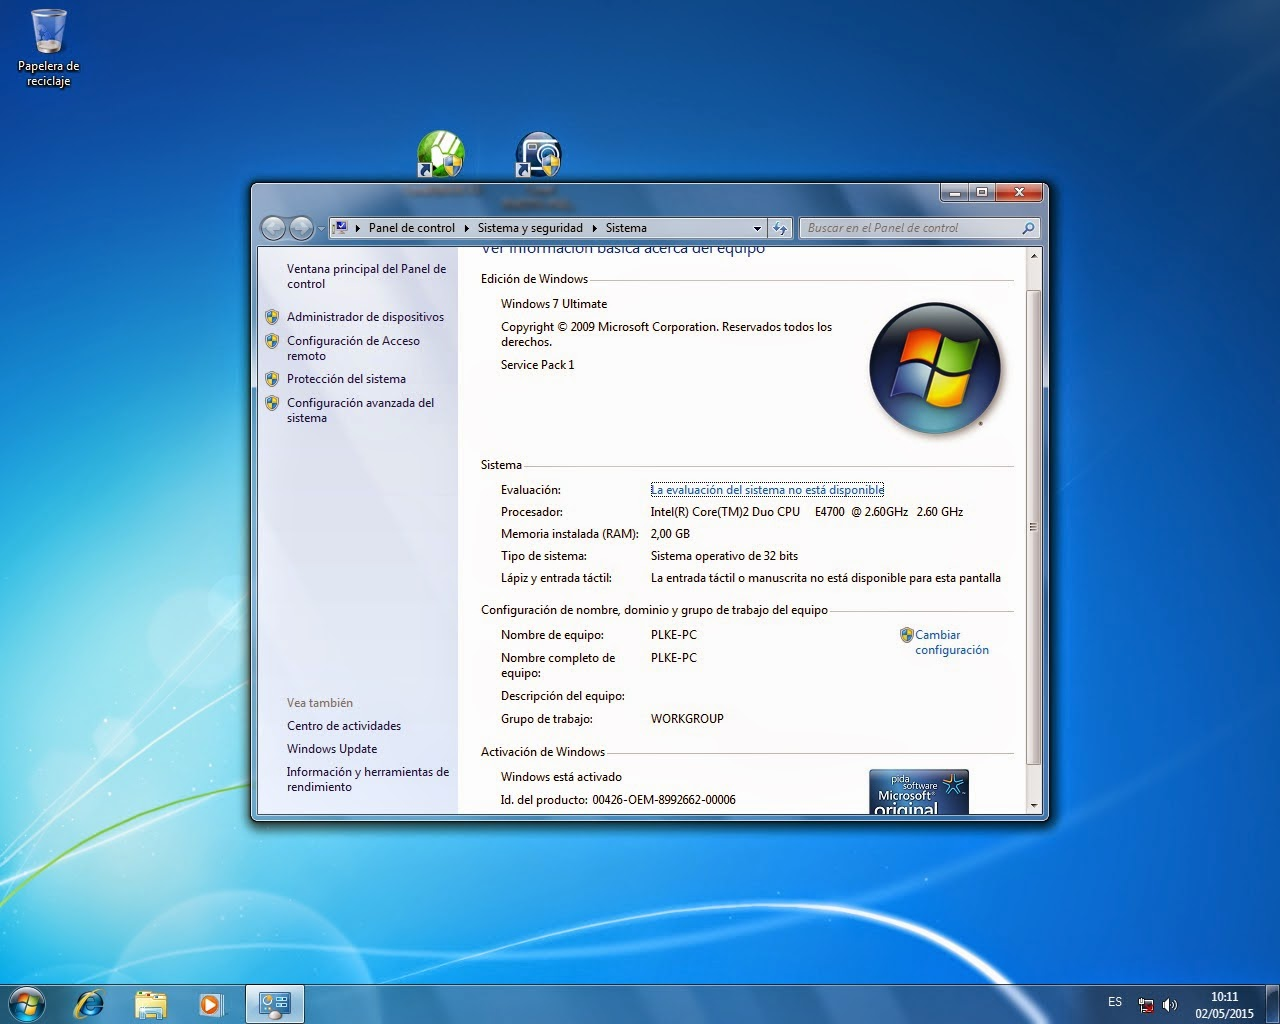 Instalar Scaner Genius colorpage HR6X slim para Windows 7